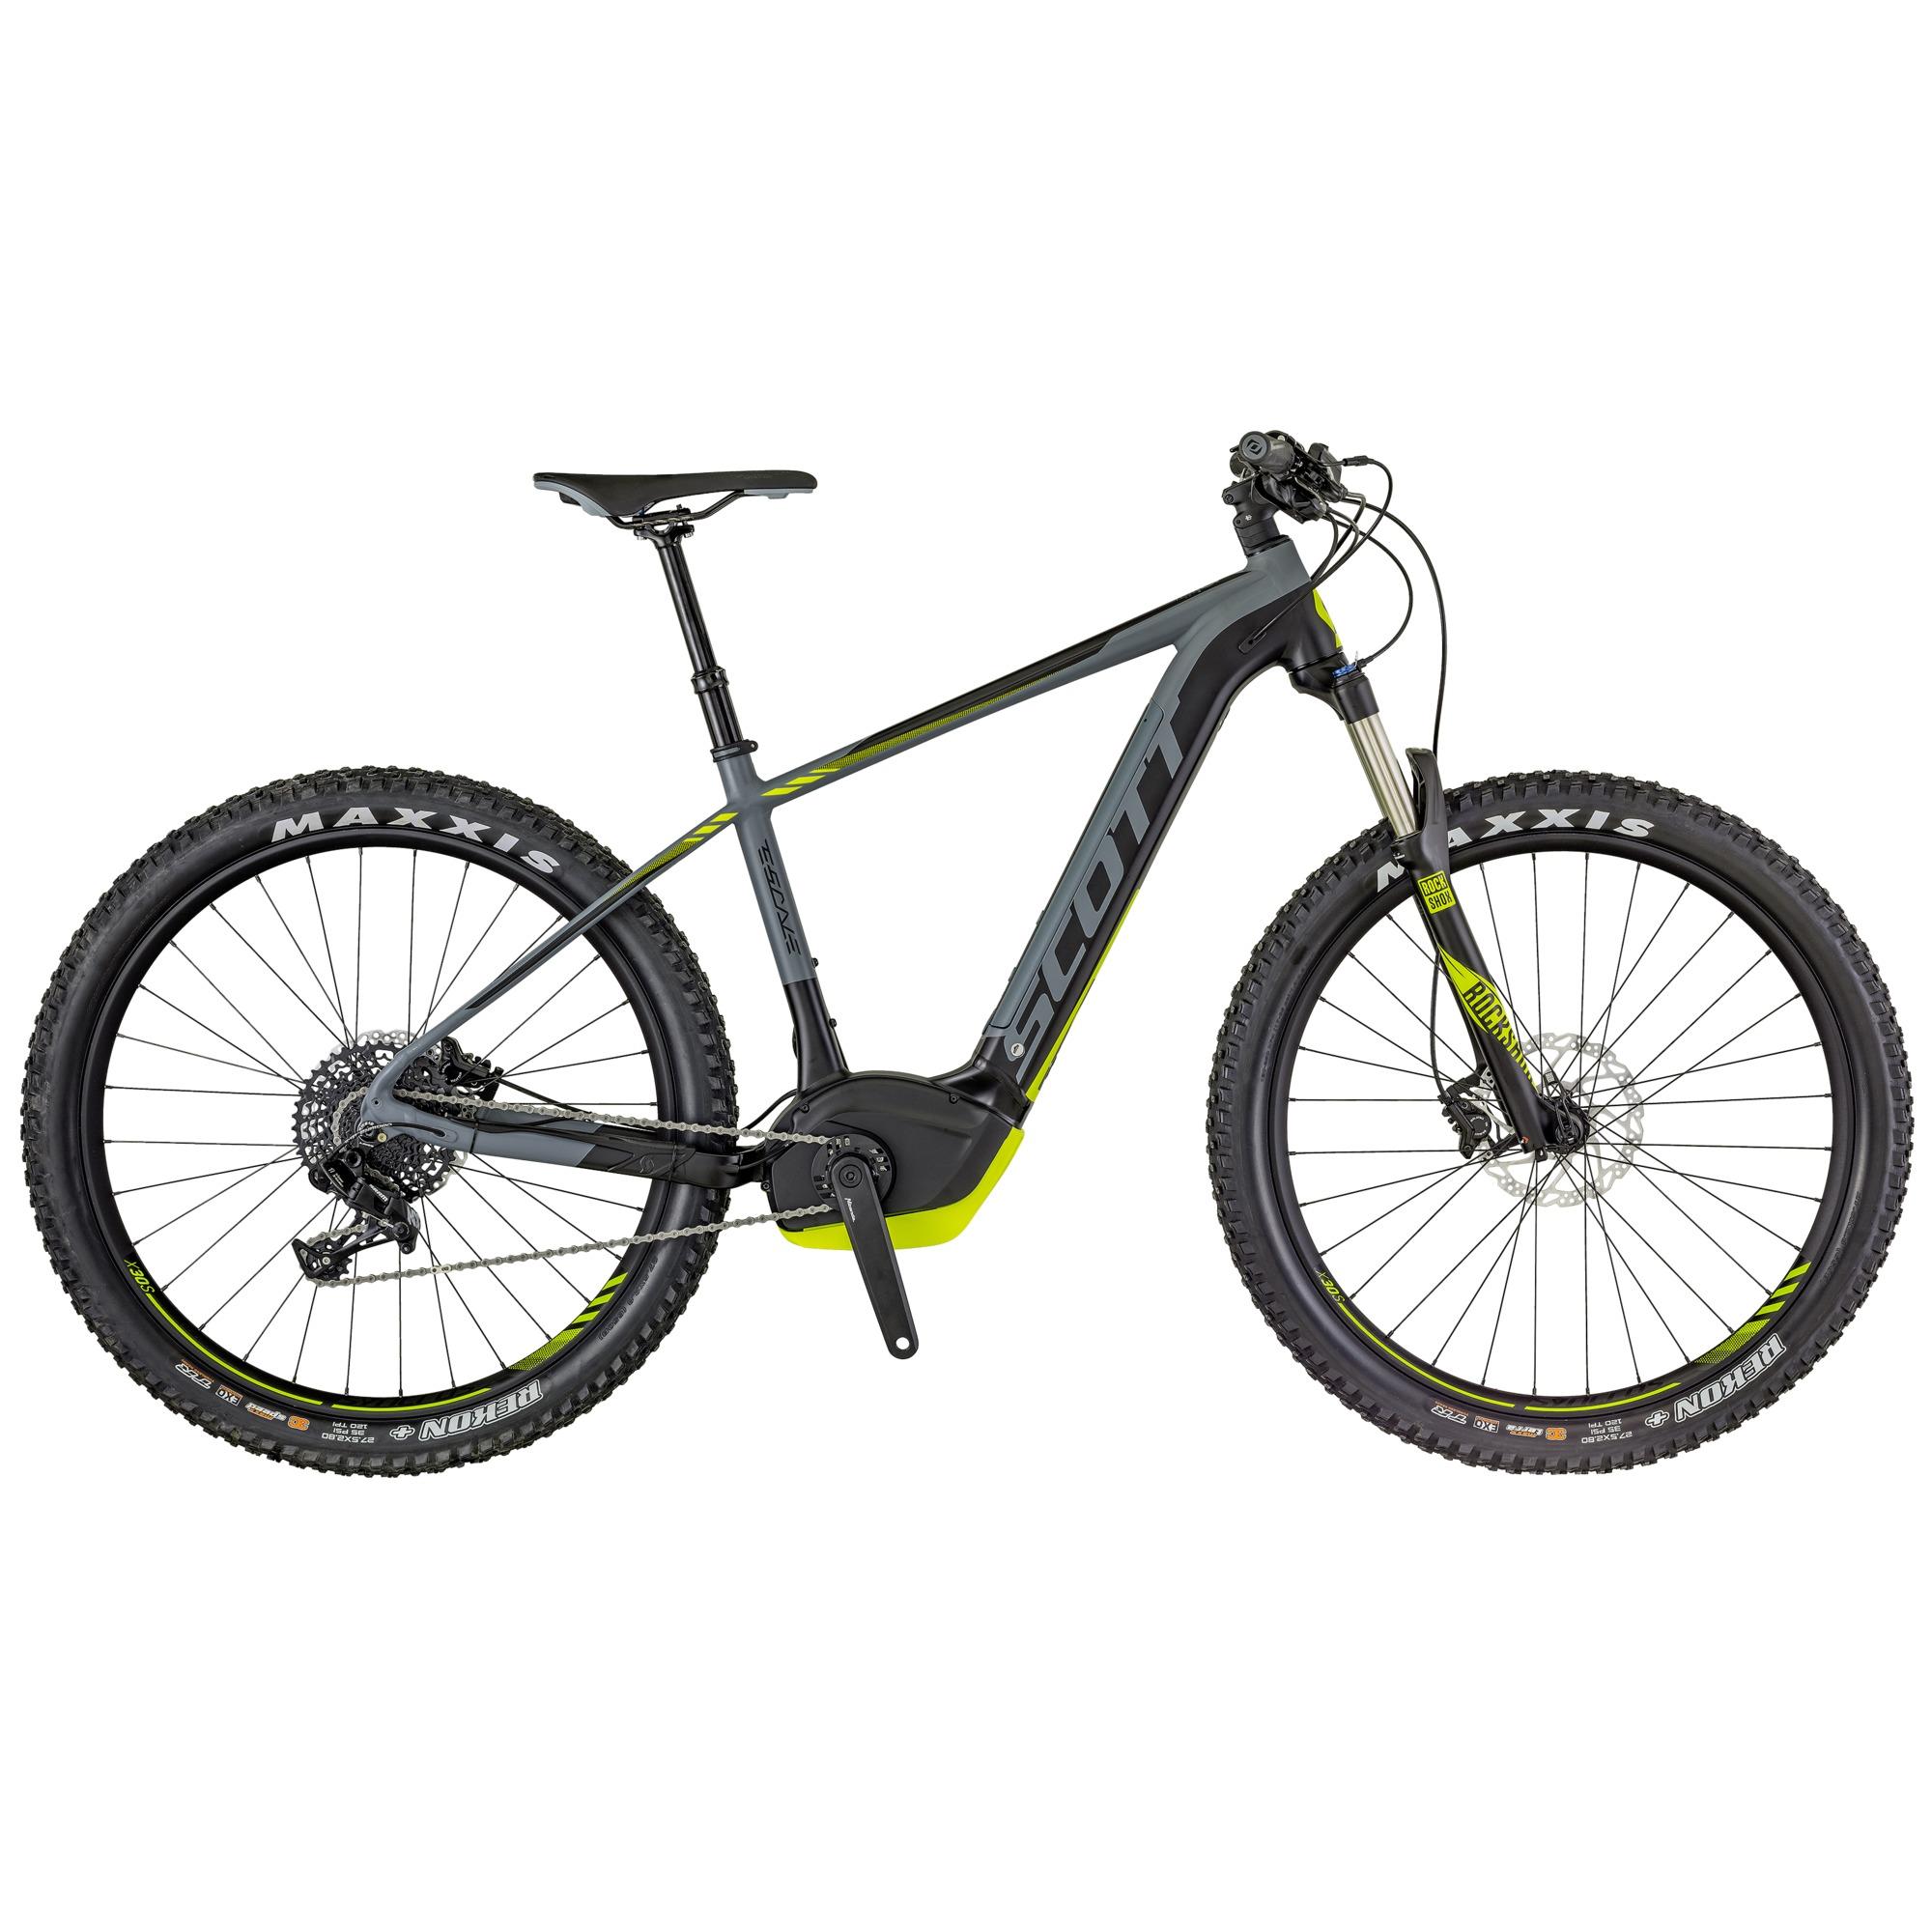 SCOTT E-Scale 720 Bike L - Zweirad Homann